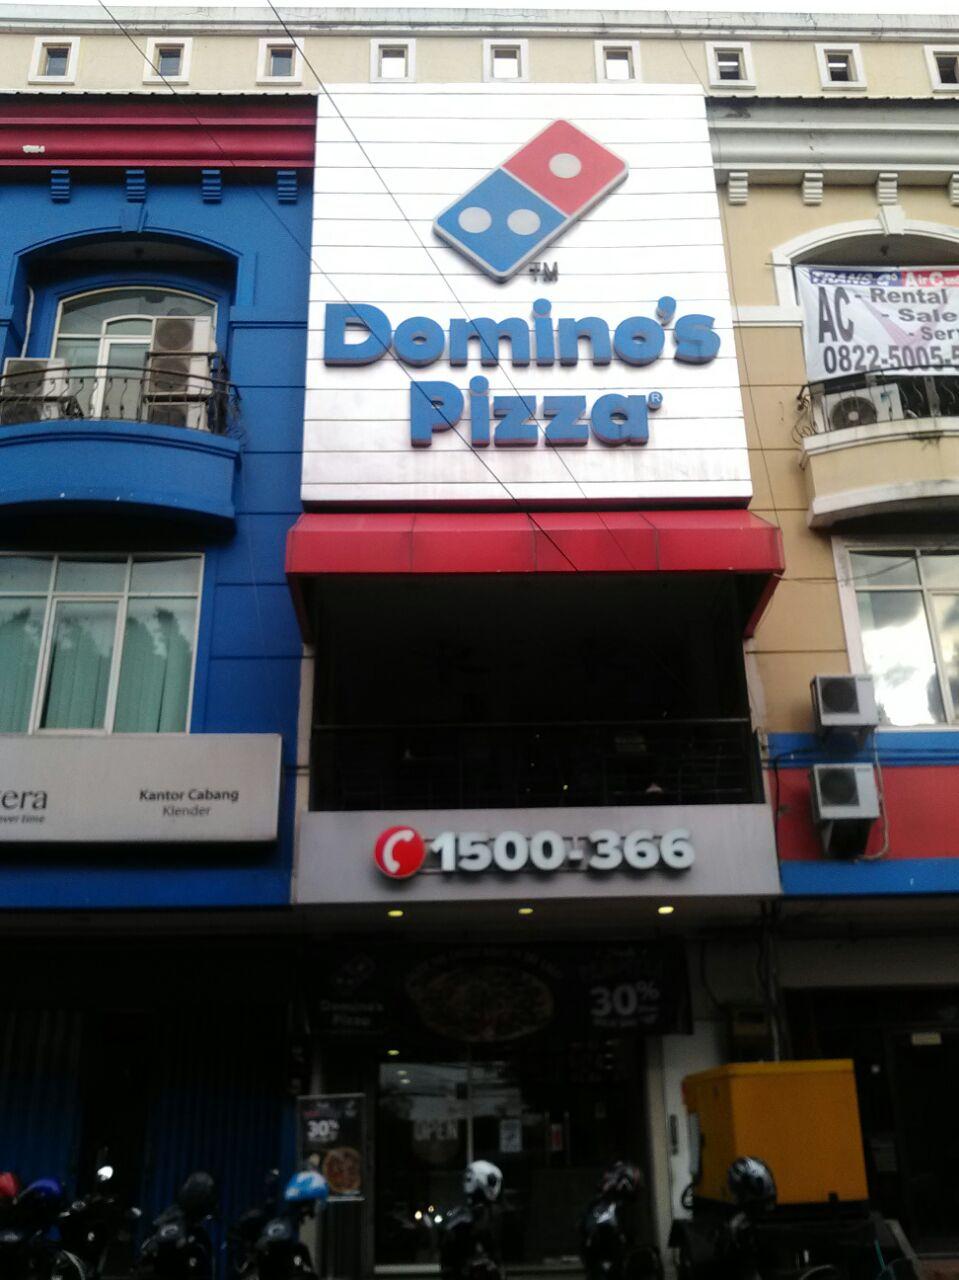 Domino's Pizza - Duren Sawit, Jakarta Timur